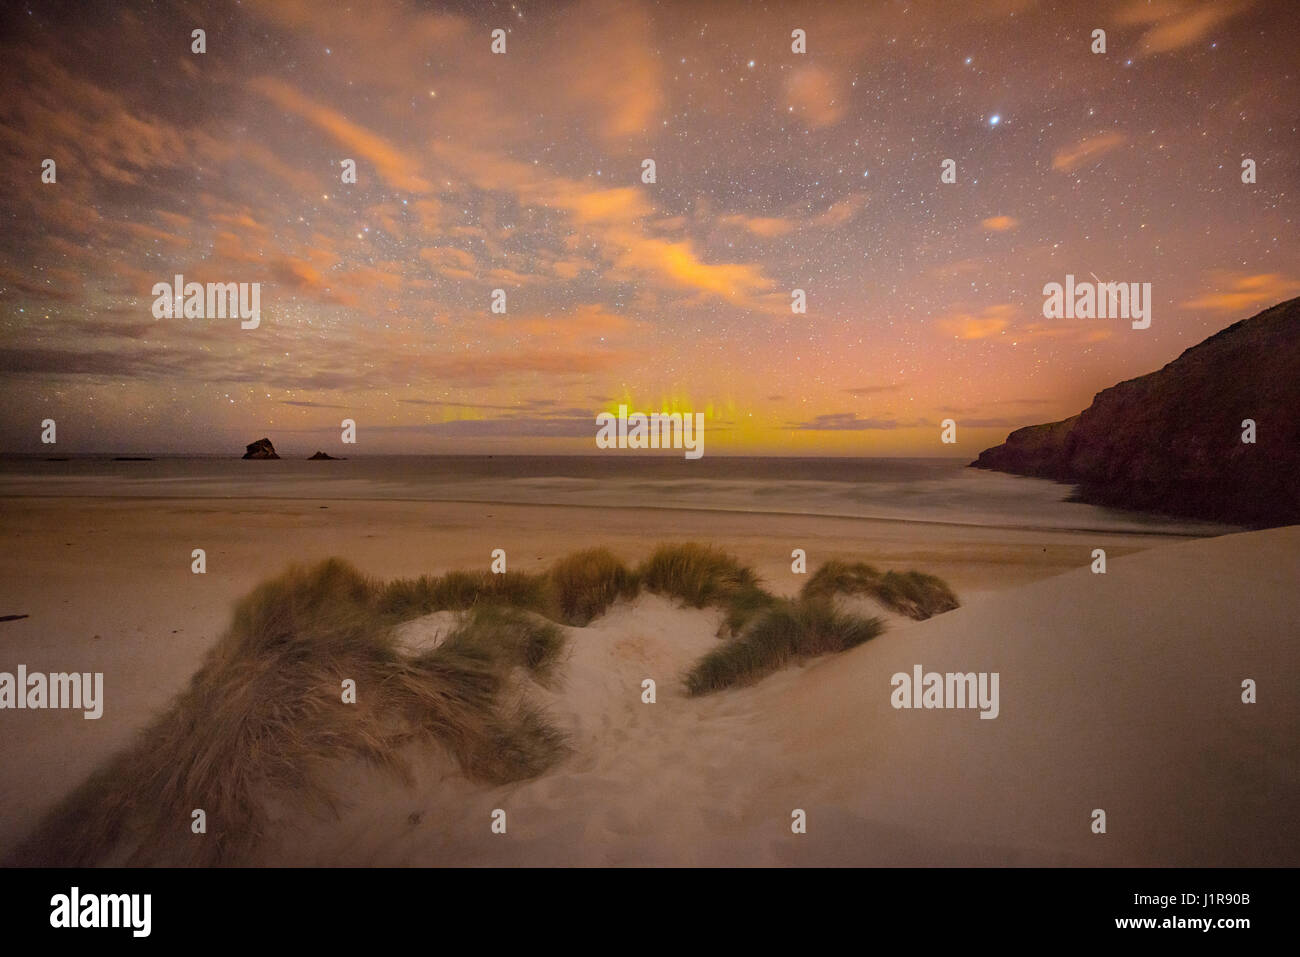 Southern lights, aurora australis over the sea, sand dunes, Sandfly Bay, Dunedin, Otago, Otago Peninsula, Southland, - Stock Image